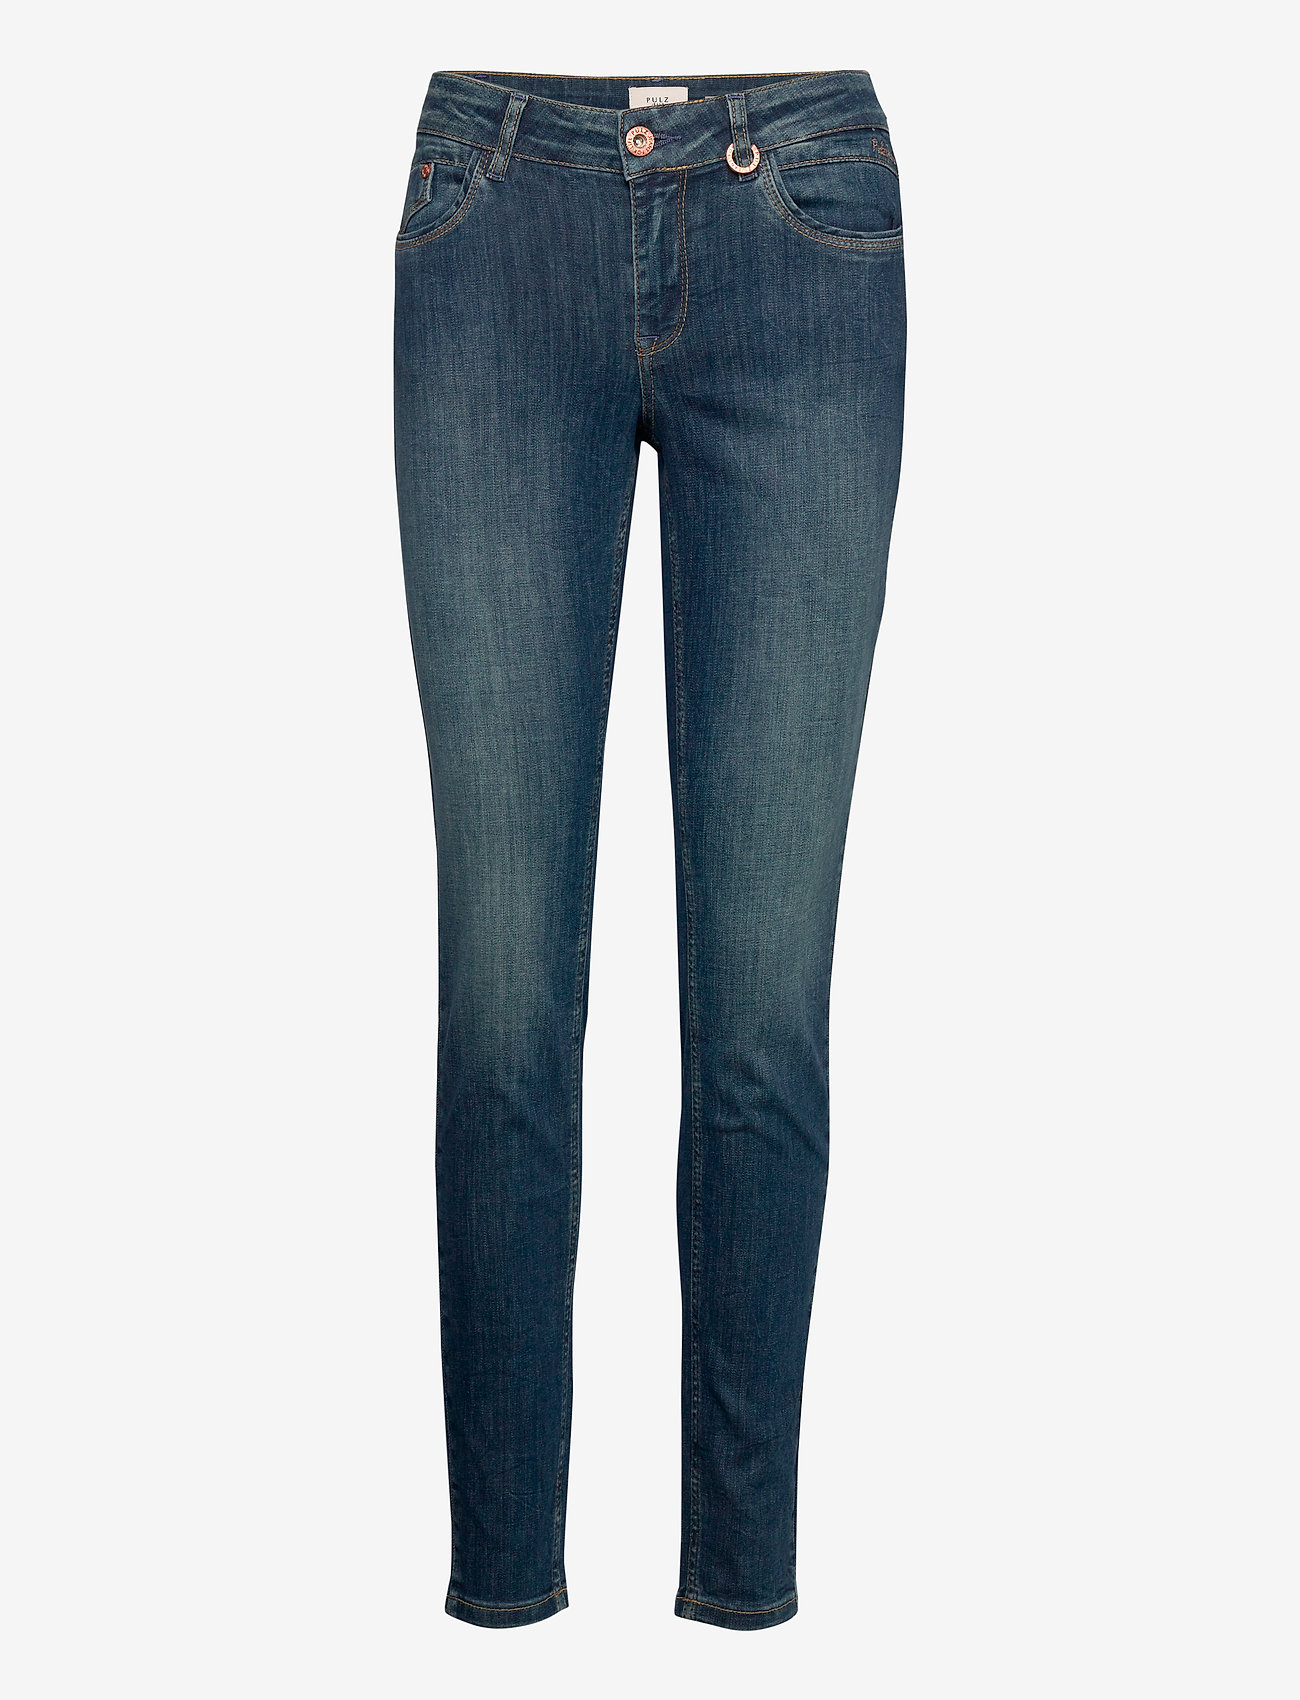 Pulz Jeans - PZANNA Jeans - slim jeans - dark blue denim - 0